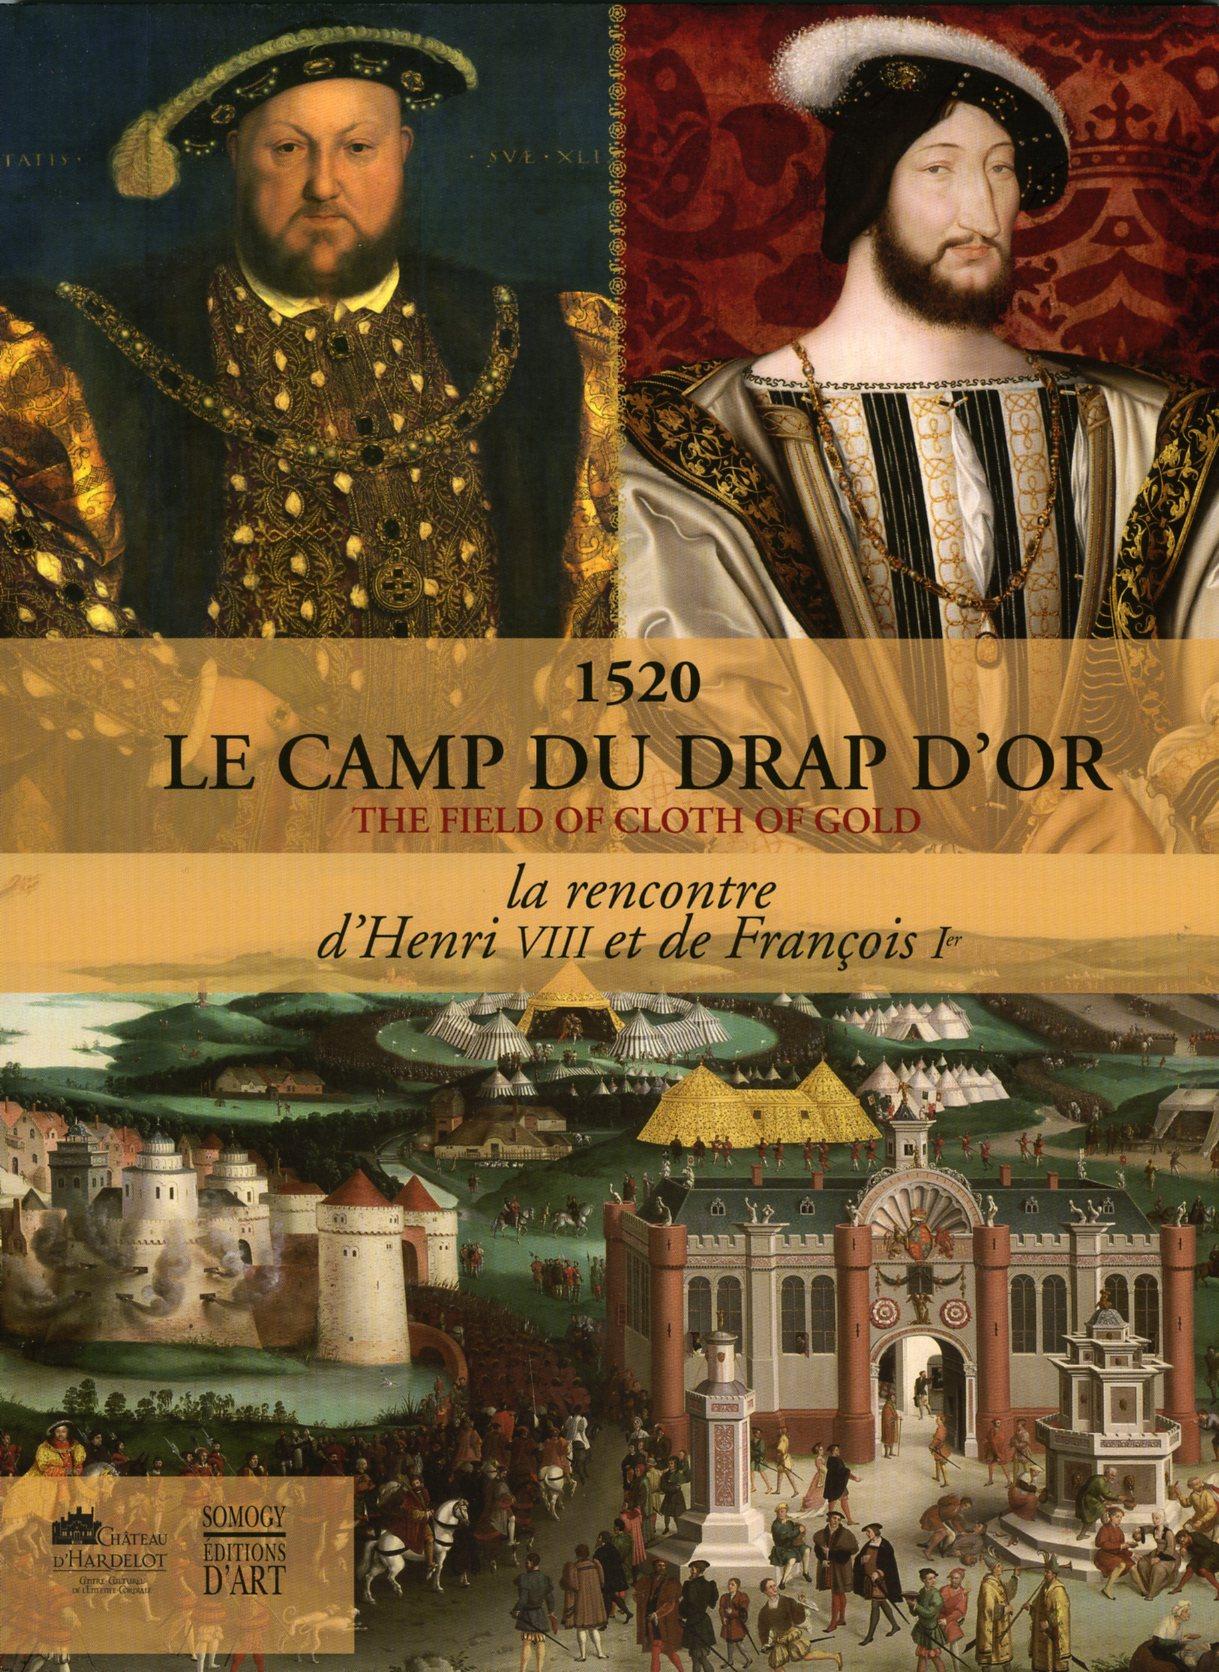 1520 le camp du drap d or the field of cloth of gold la rencontre d henri viii et de. Black Bedroom Furniture Sets. Home Design Ideas